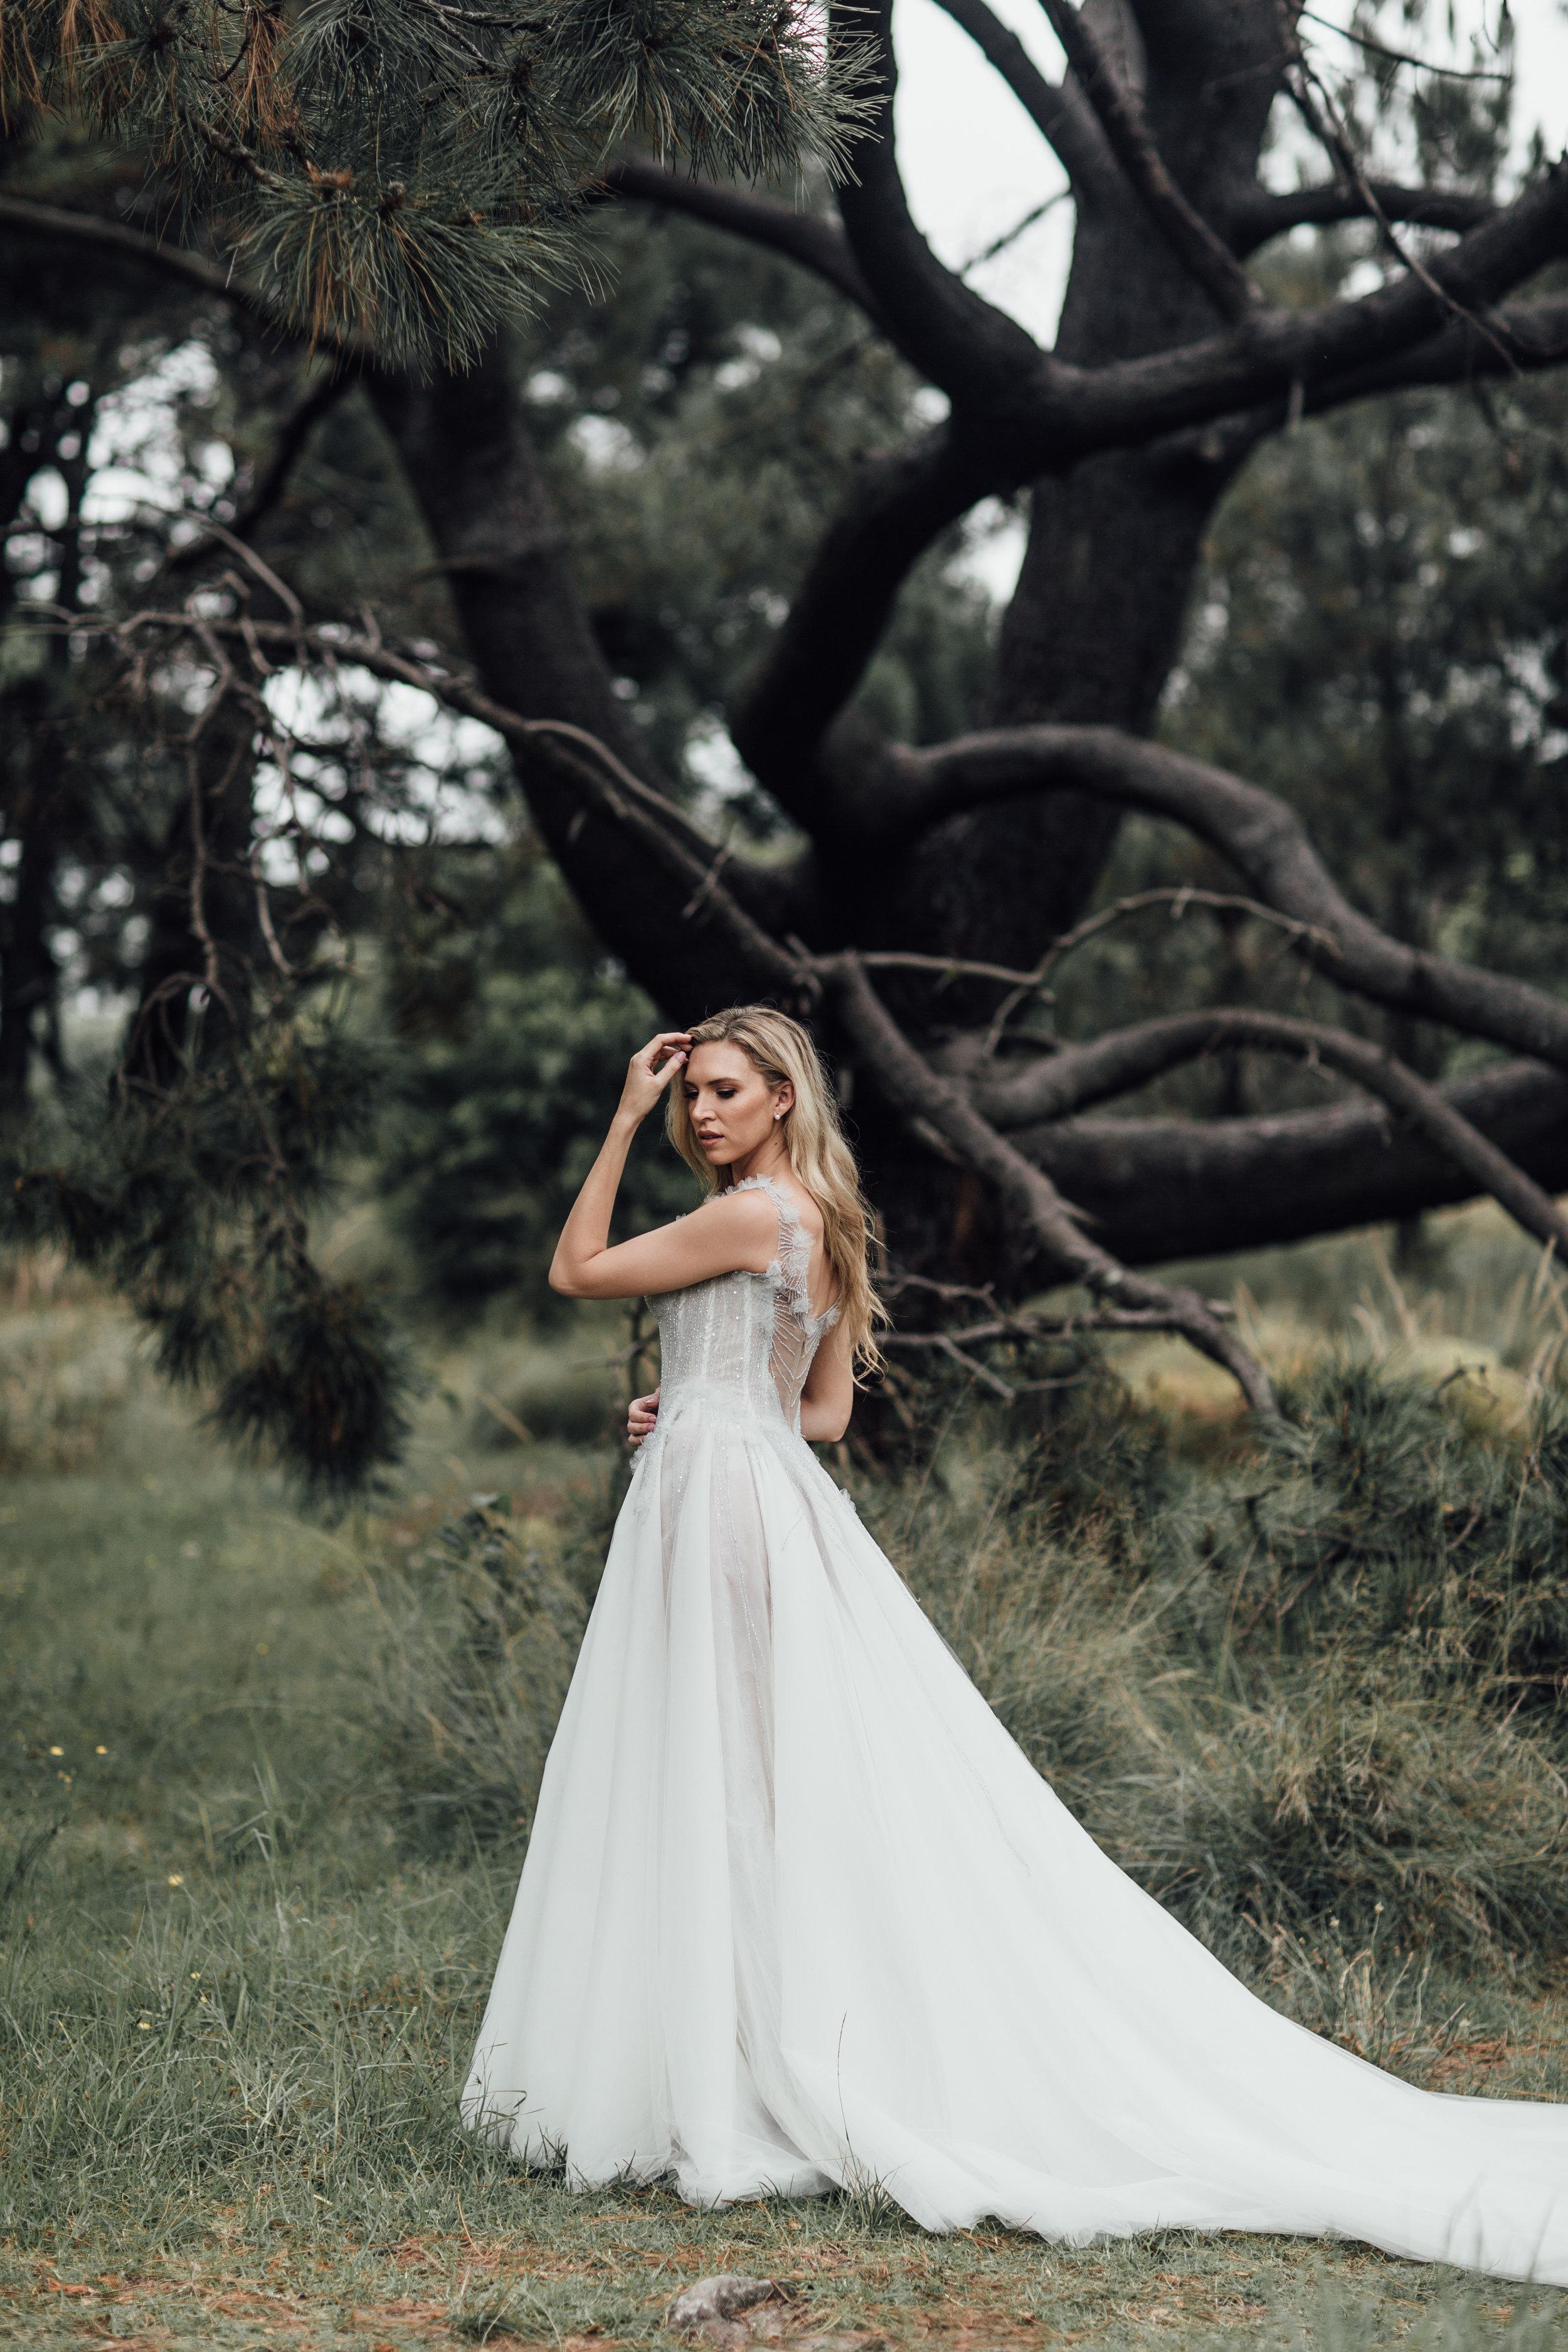 Ivonn-Couture-Eden-Couture-Collection-205.jpg